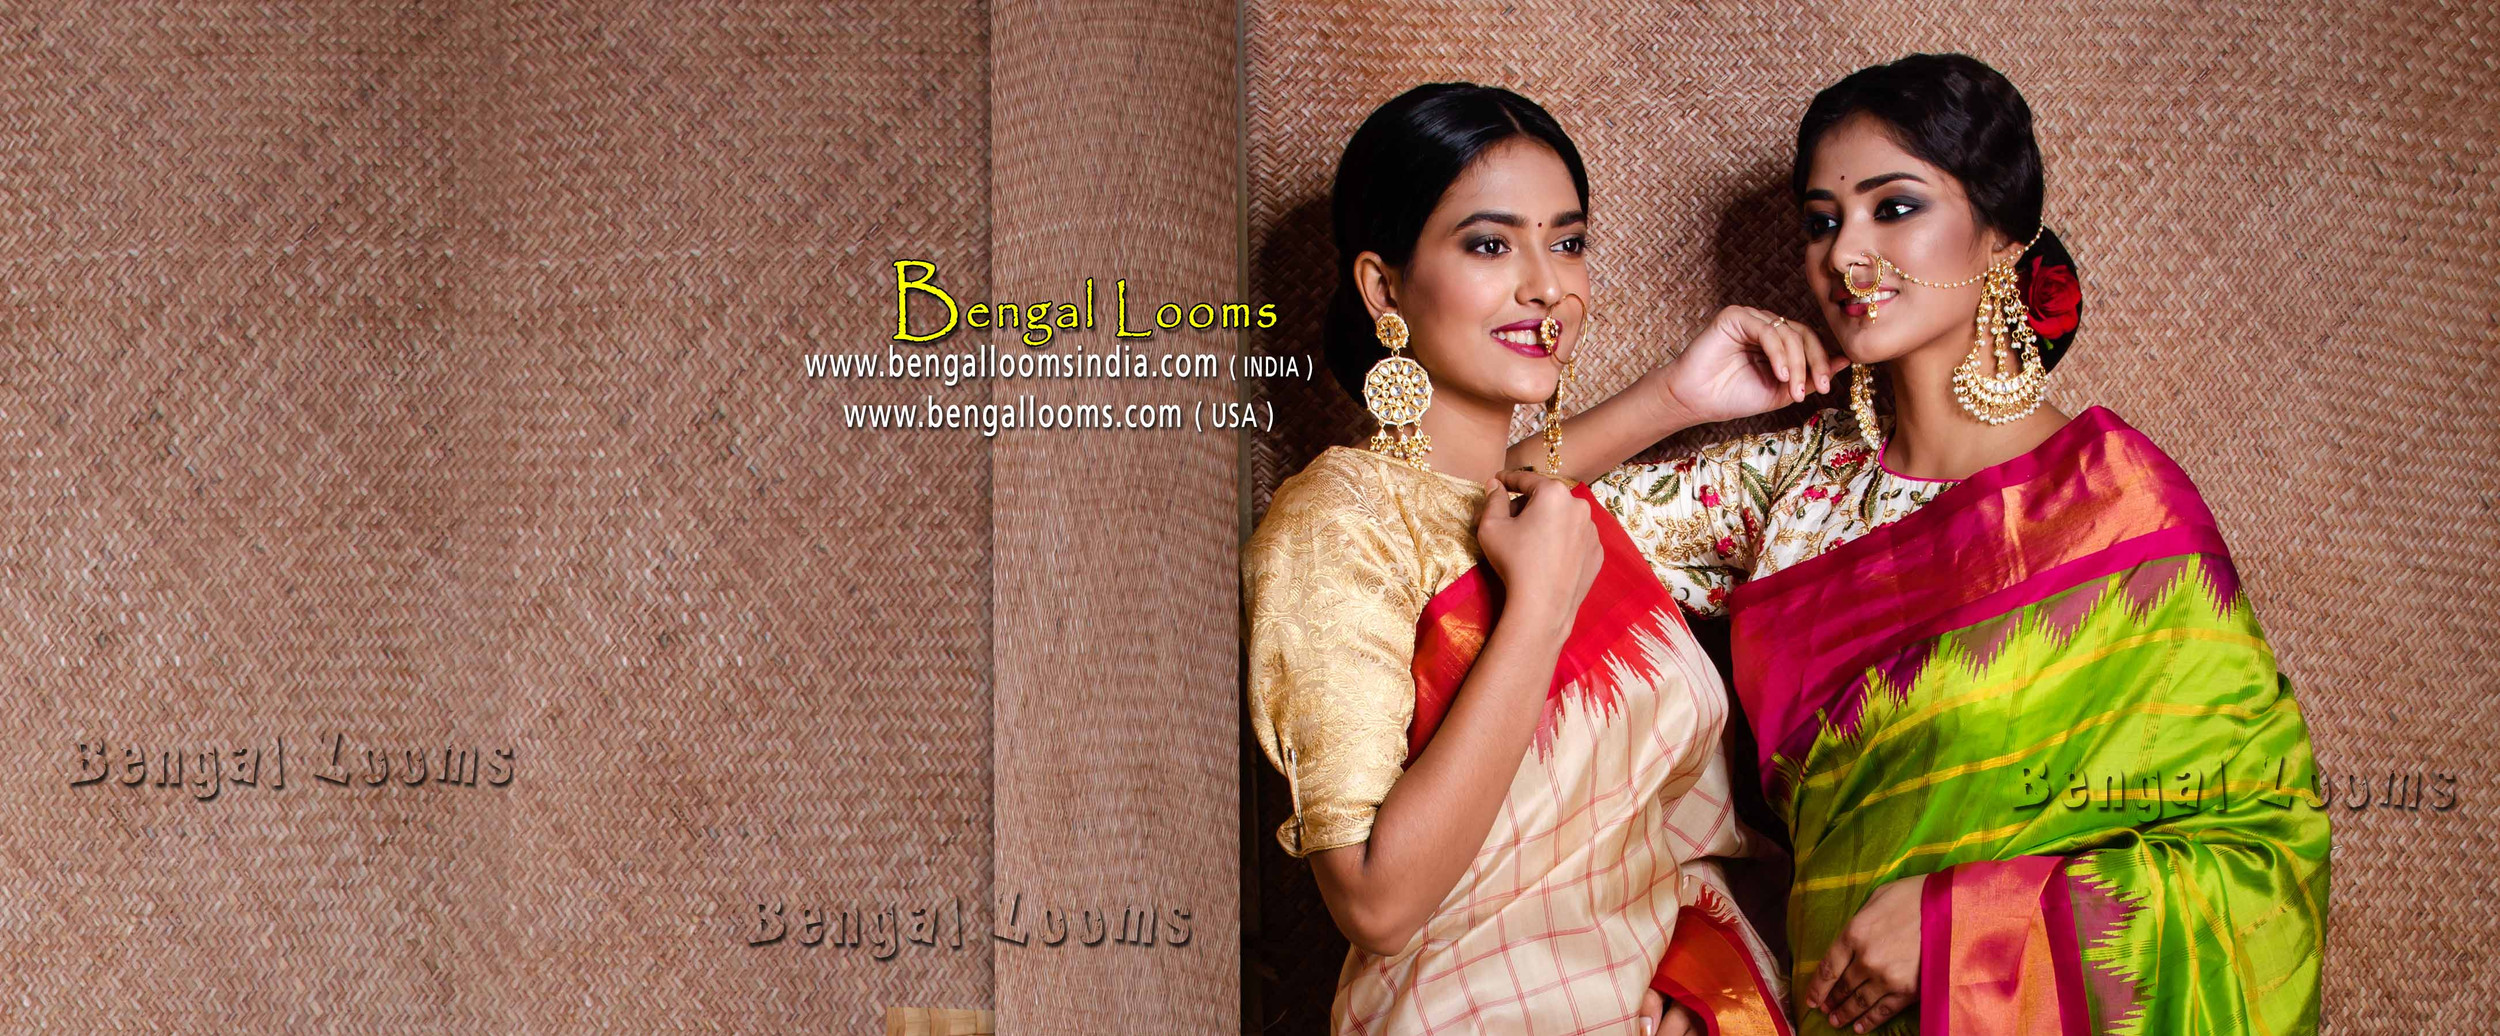 d97c5b462b Saree Deals Under $200 | Online Shopping | Bengal Looms